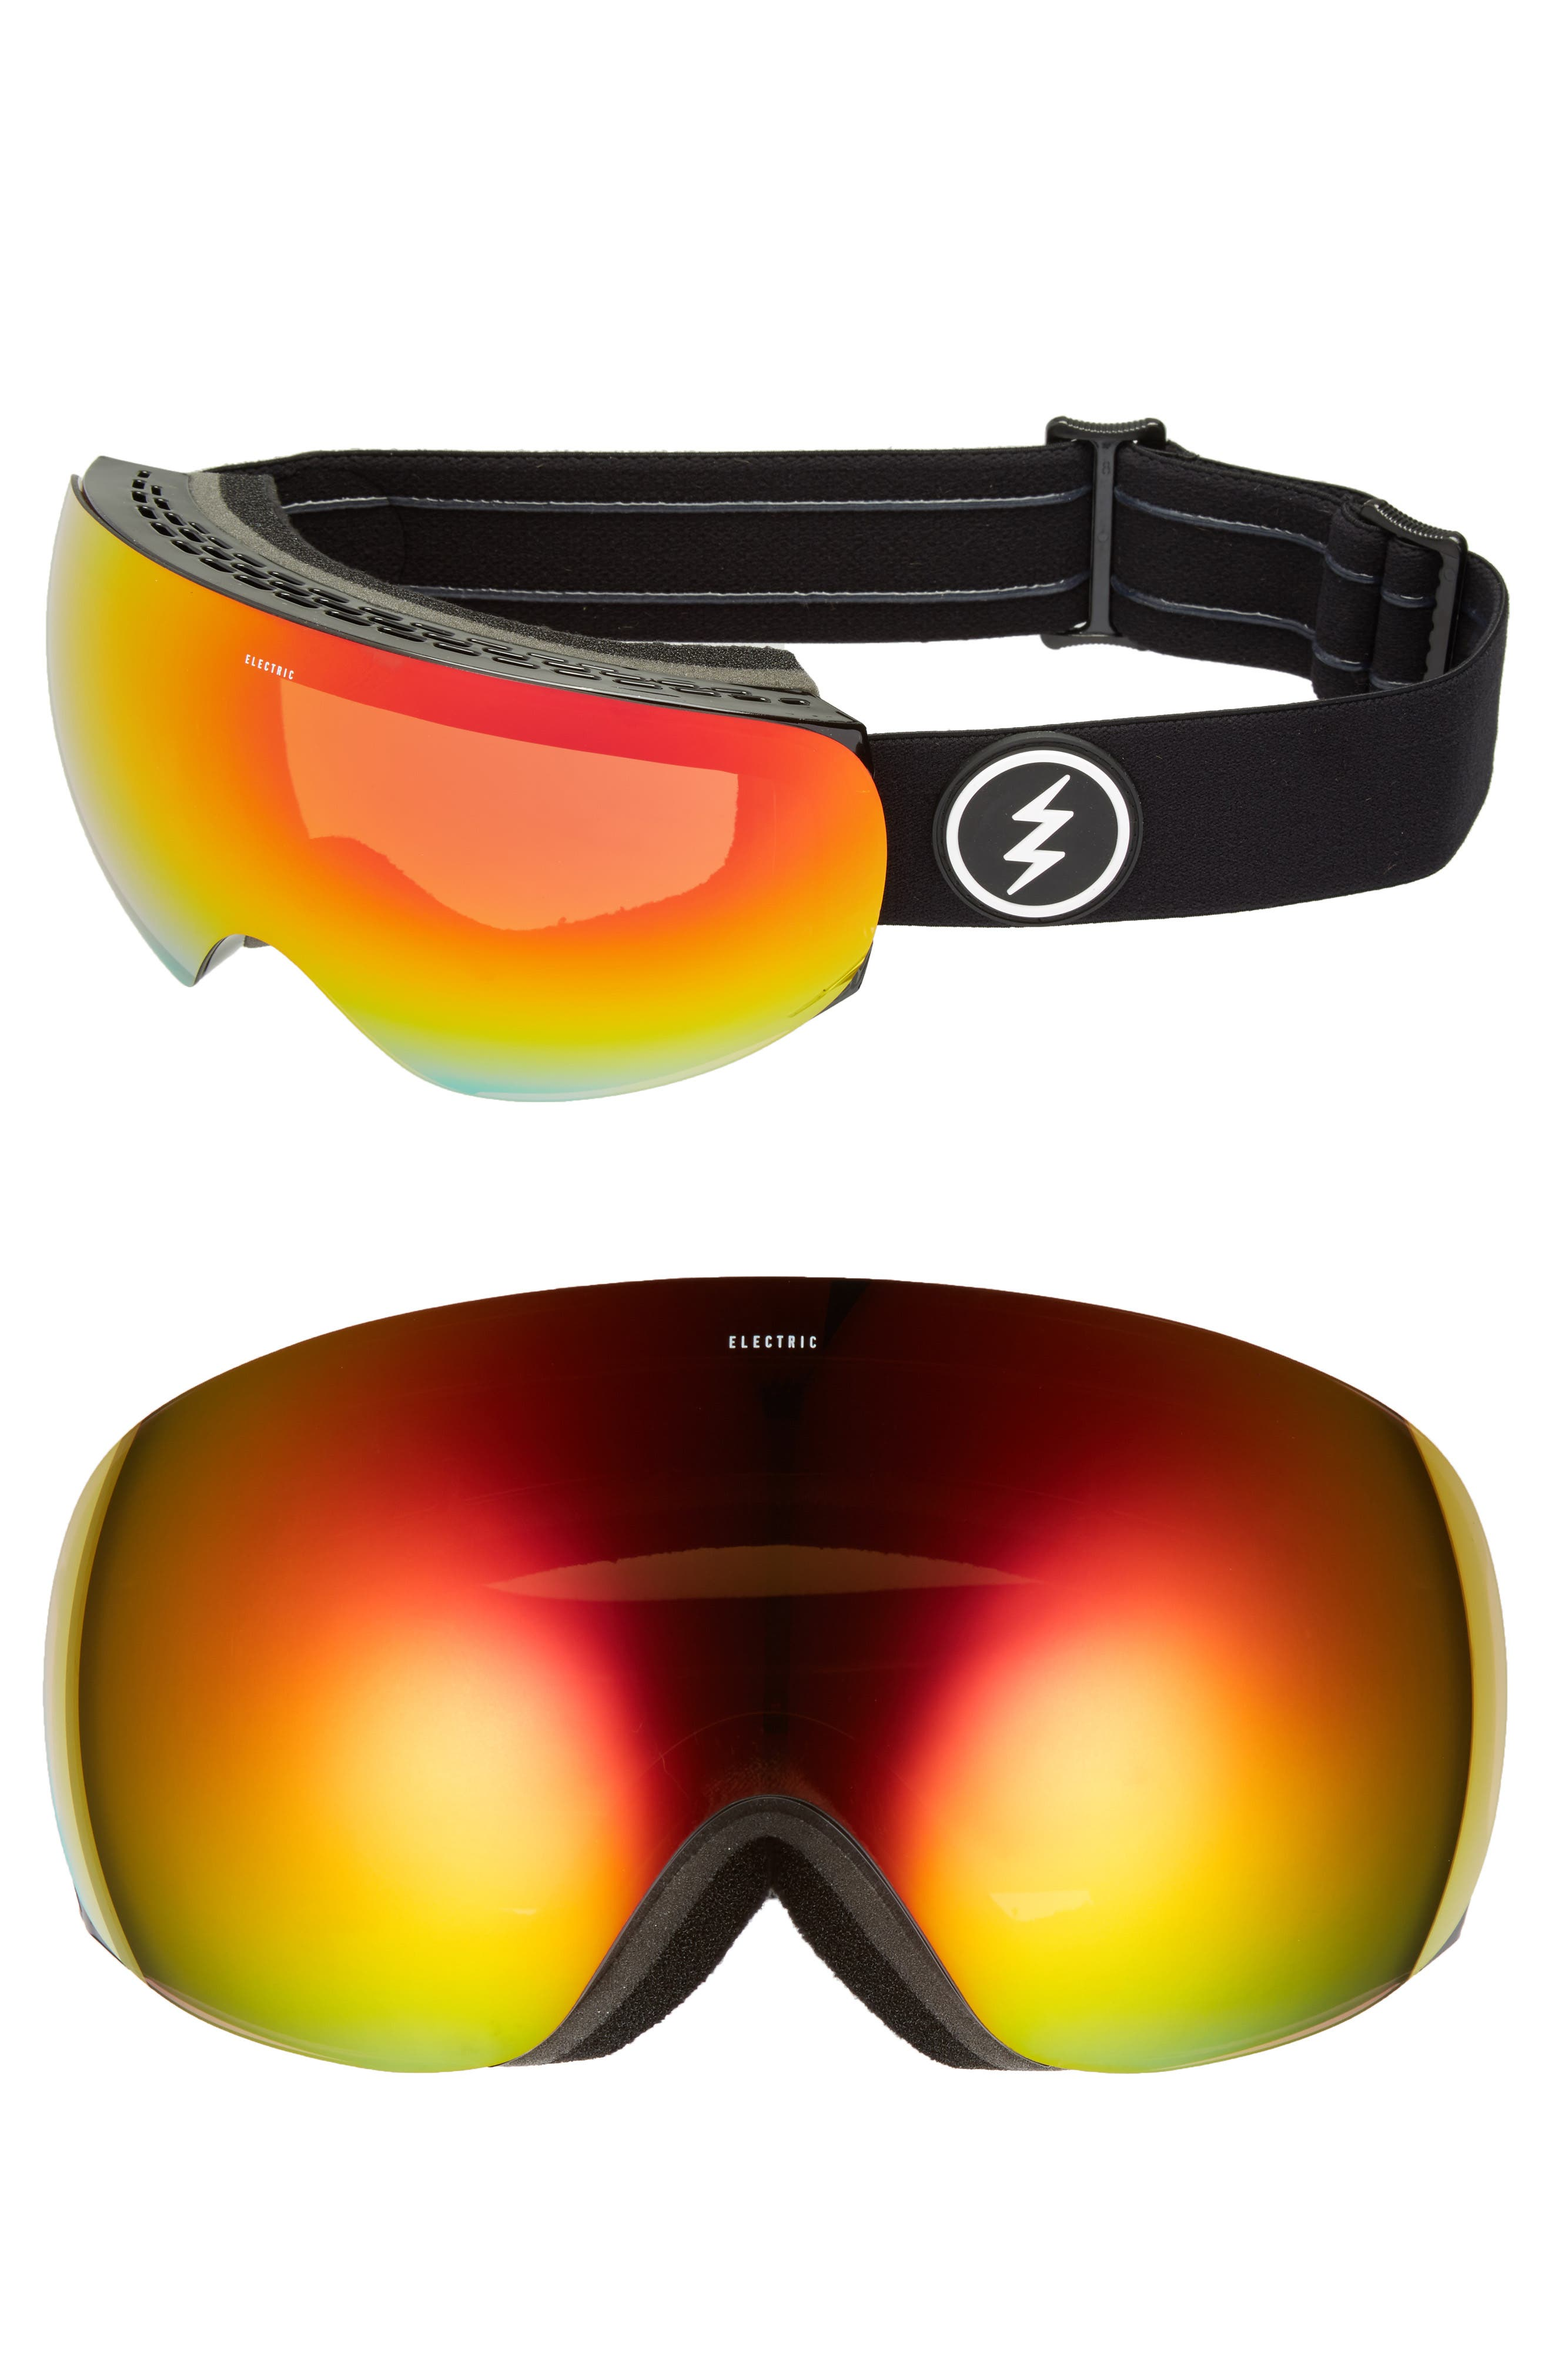 EG3.5 Snow Goggles,                             Main thumbnail 1, color,                             Gloss Black/ Red Chrome